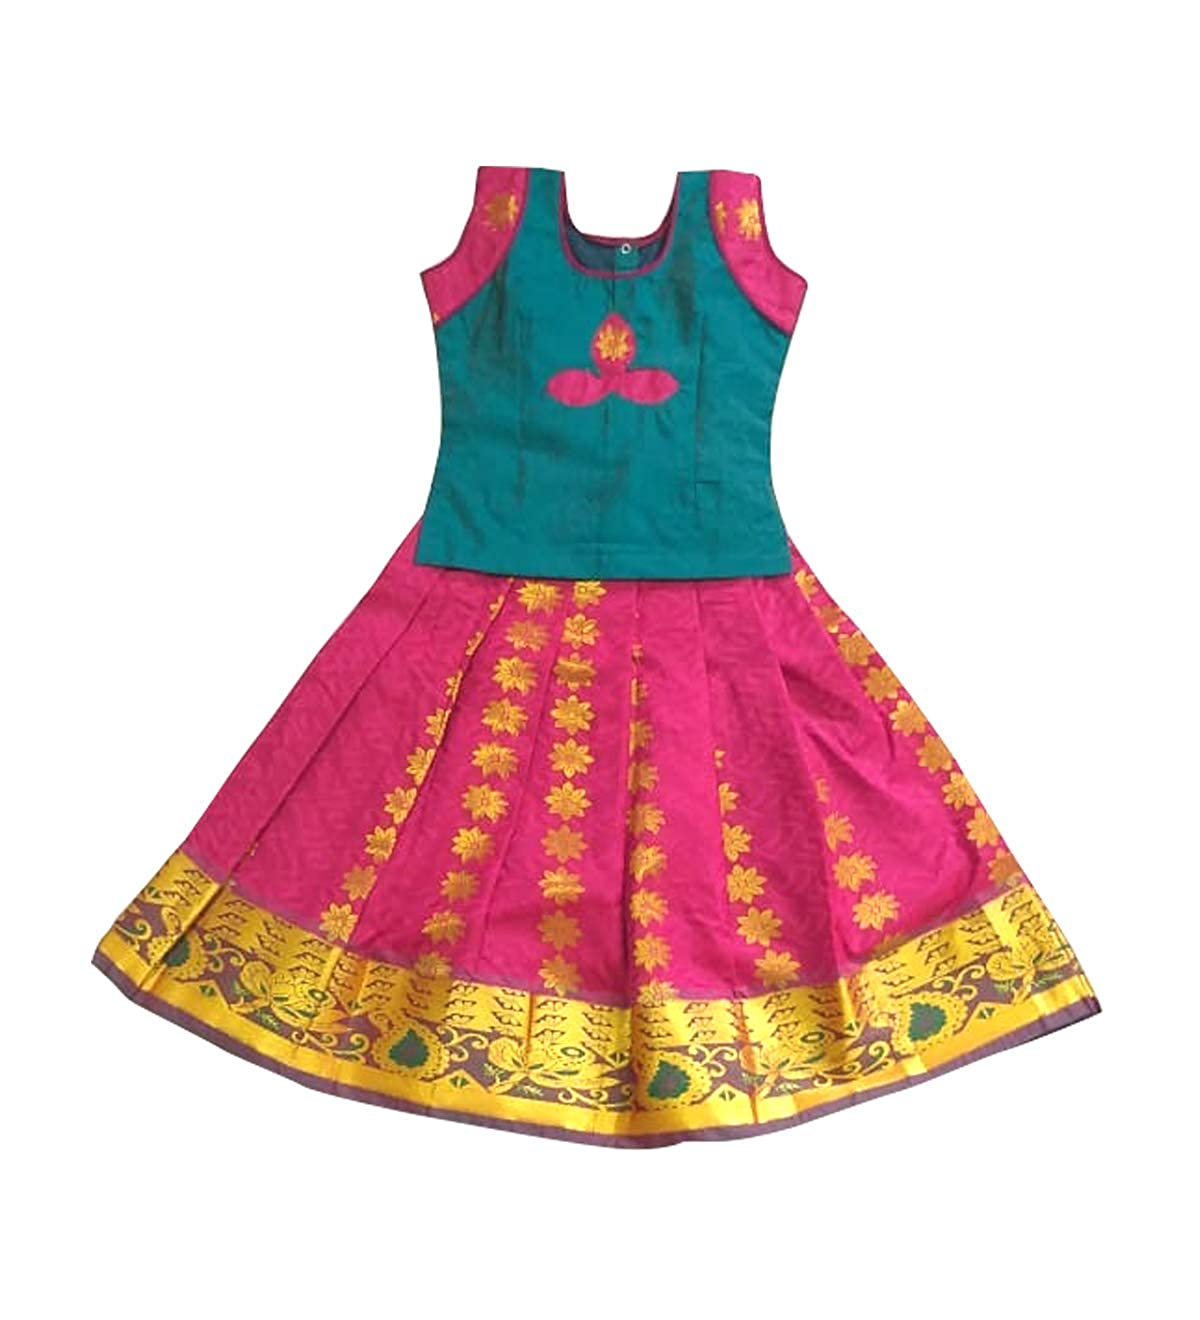 01e57704c738 Pattu Pavadai Semi Raw Silk Pavadai Pink and Rama Green for Baby Girls &  Kids, 4 Years: Amazon.in: Clothing & Accessories